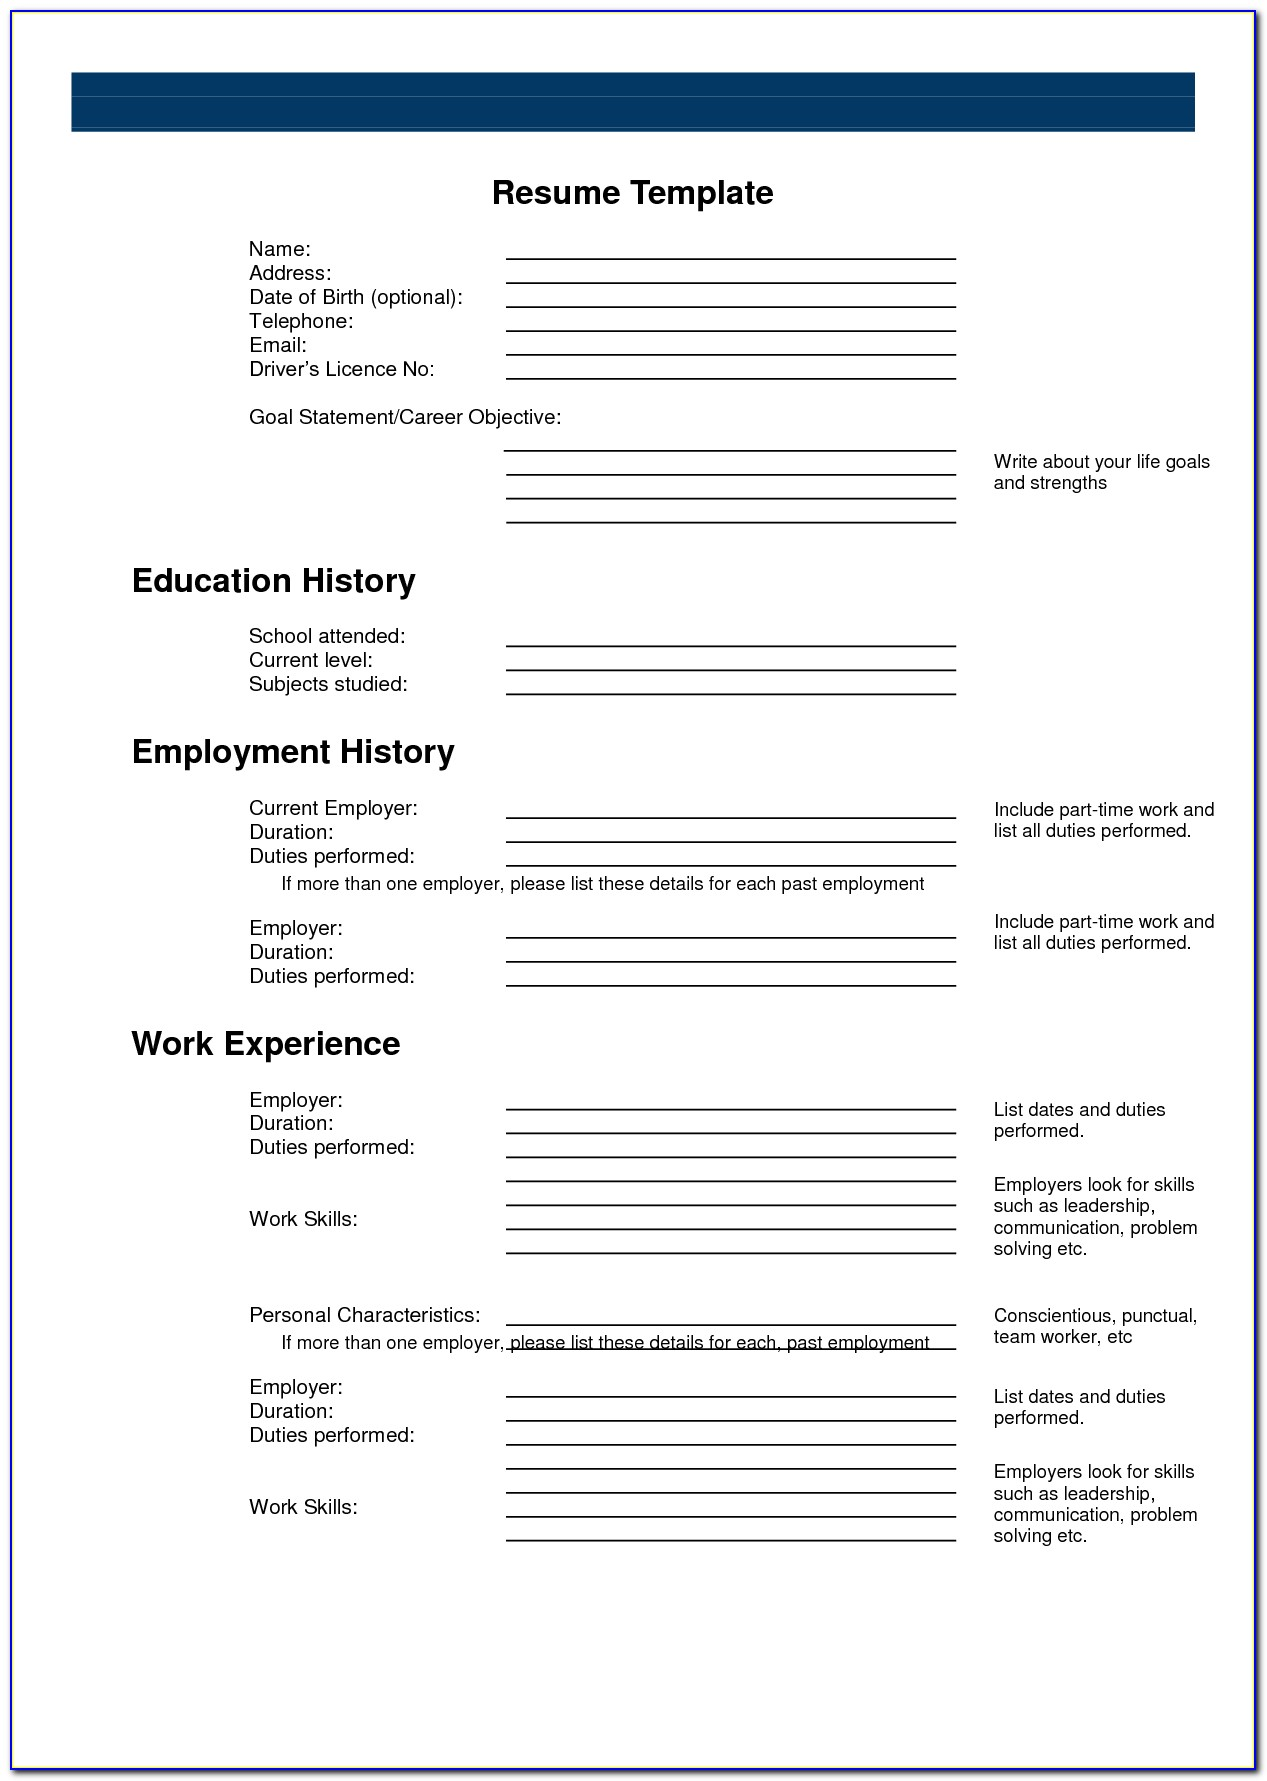 Printable Resume Template Blank